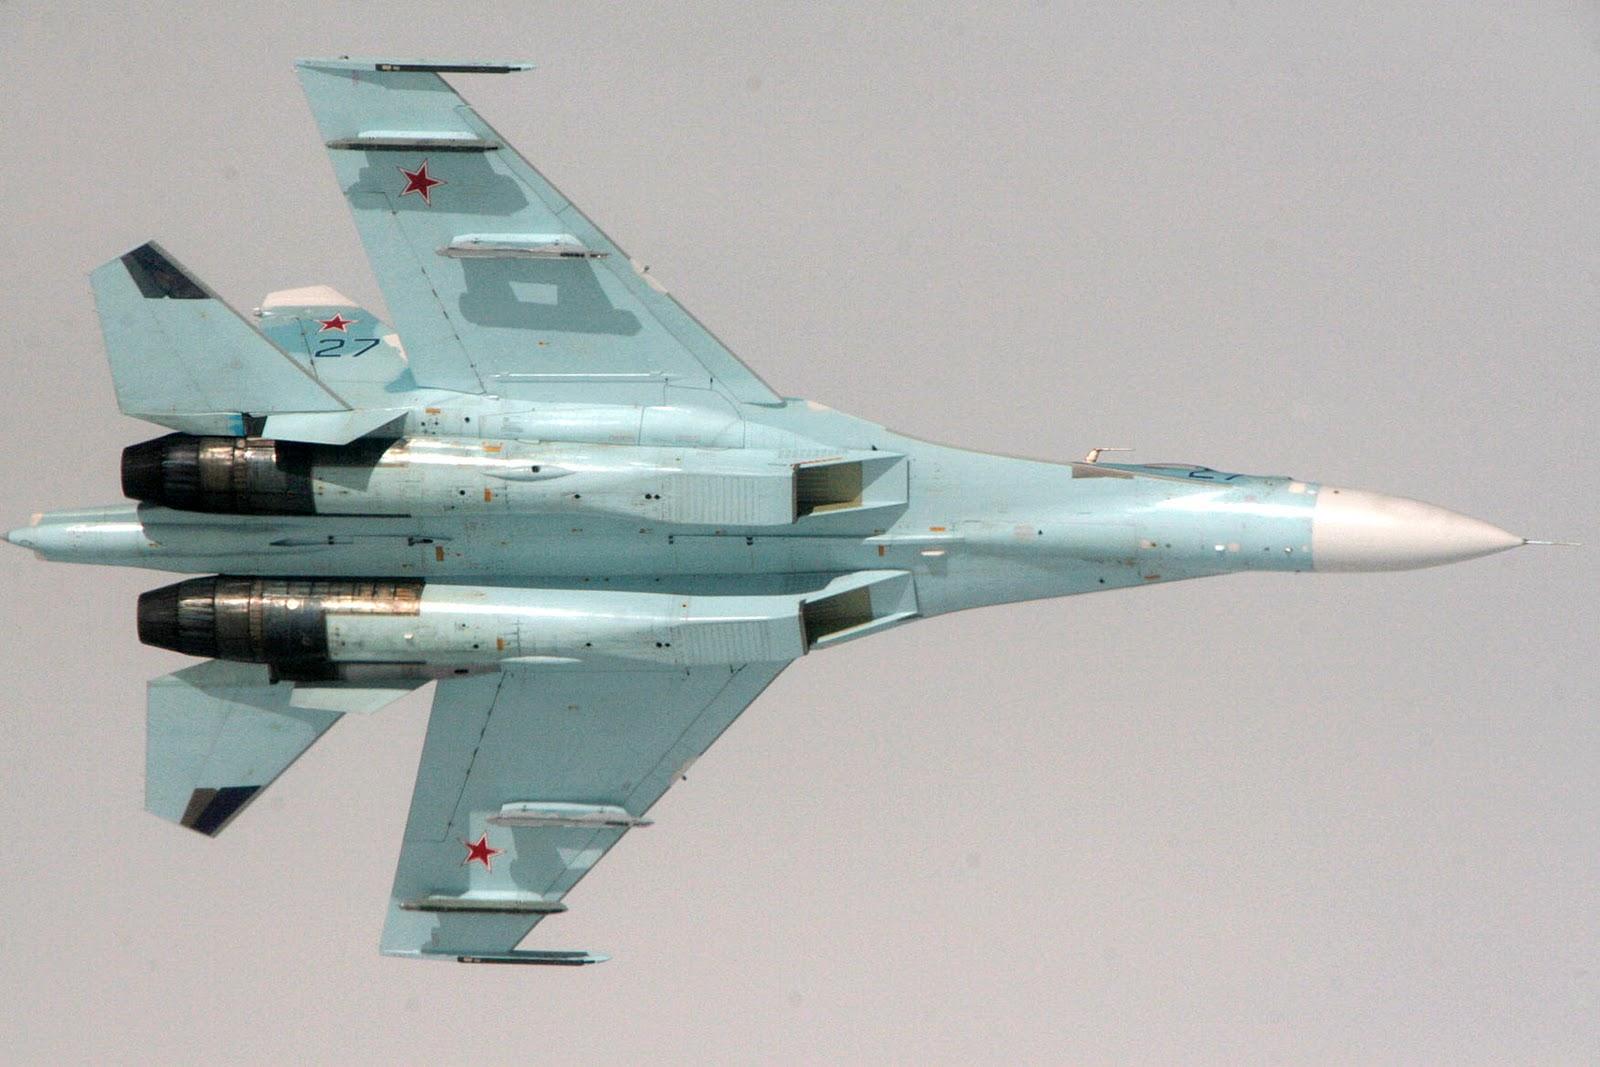 http://1.bp.blogspot.com/-CB01_LqcHUE/TWYCwUfISbI/AAAAAAAAANI/eHqLCmGpl-4/s1600/gpw-200905-unitedstatesarmy-100810-a-6937h-021-vigilant-eagle-su-27-fighter-jet-escorts-gulfstream-4-kamchatka-peninsula-russia-august-2010-original.jpg